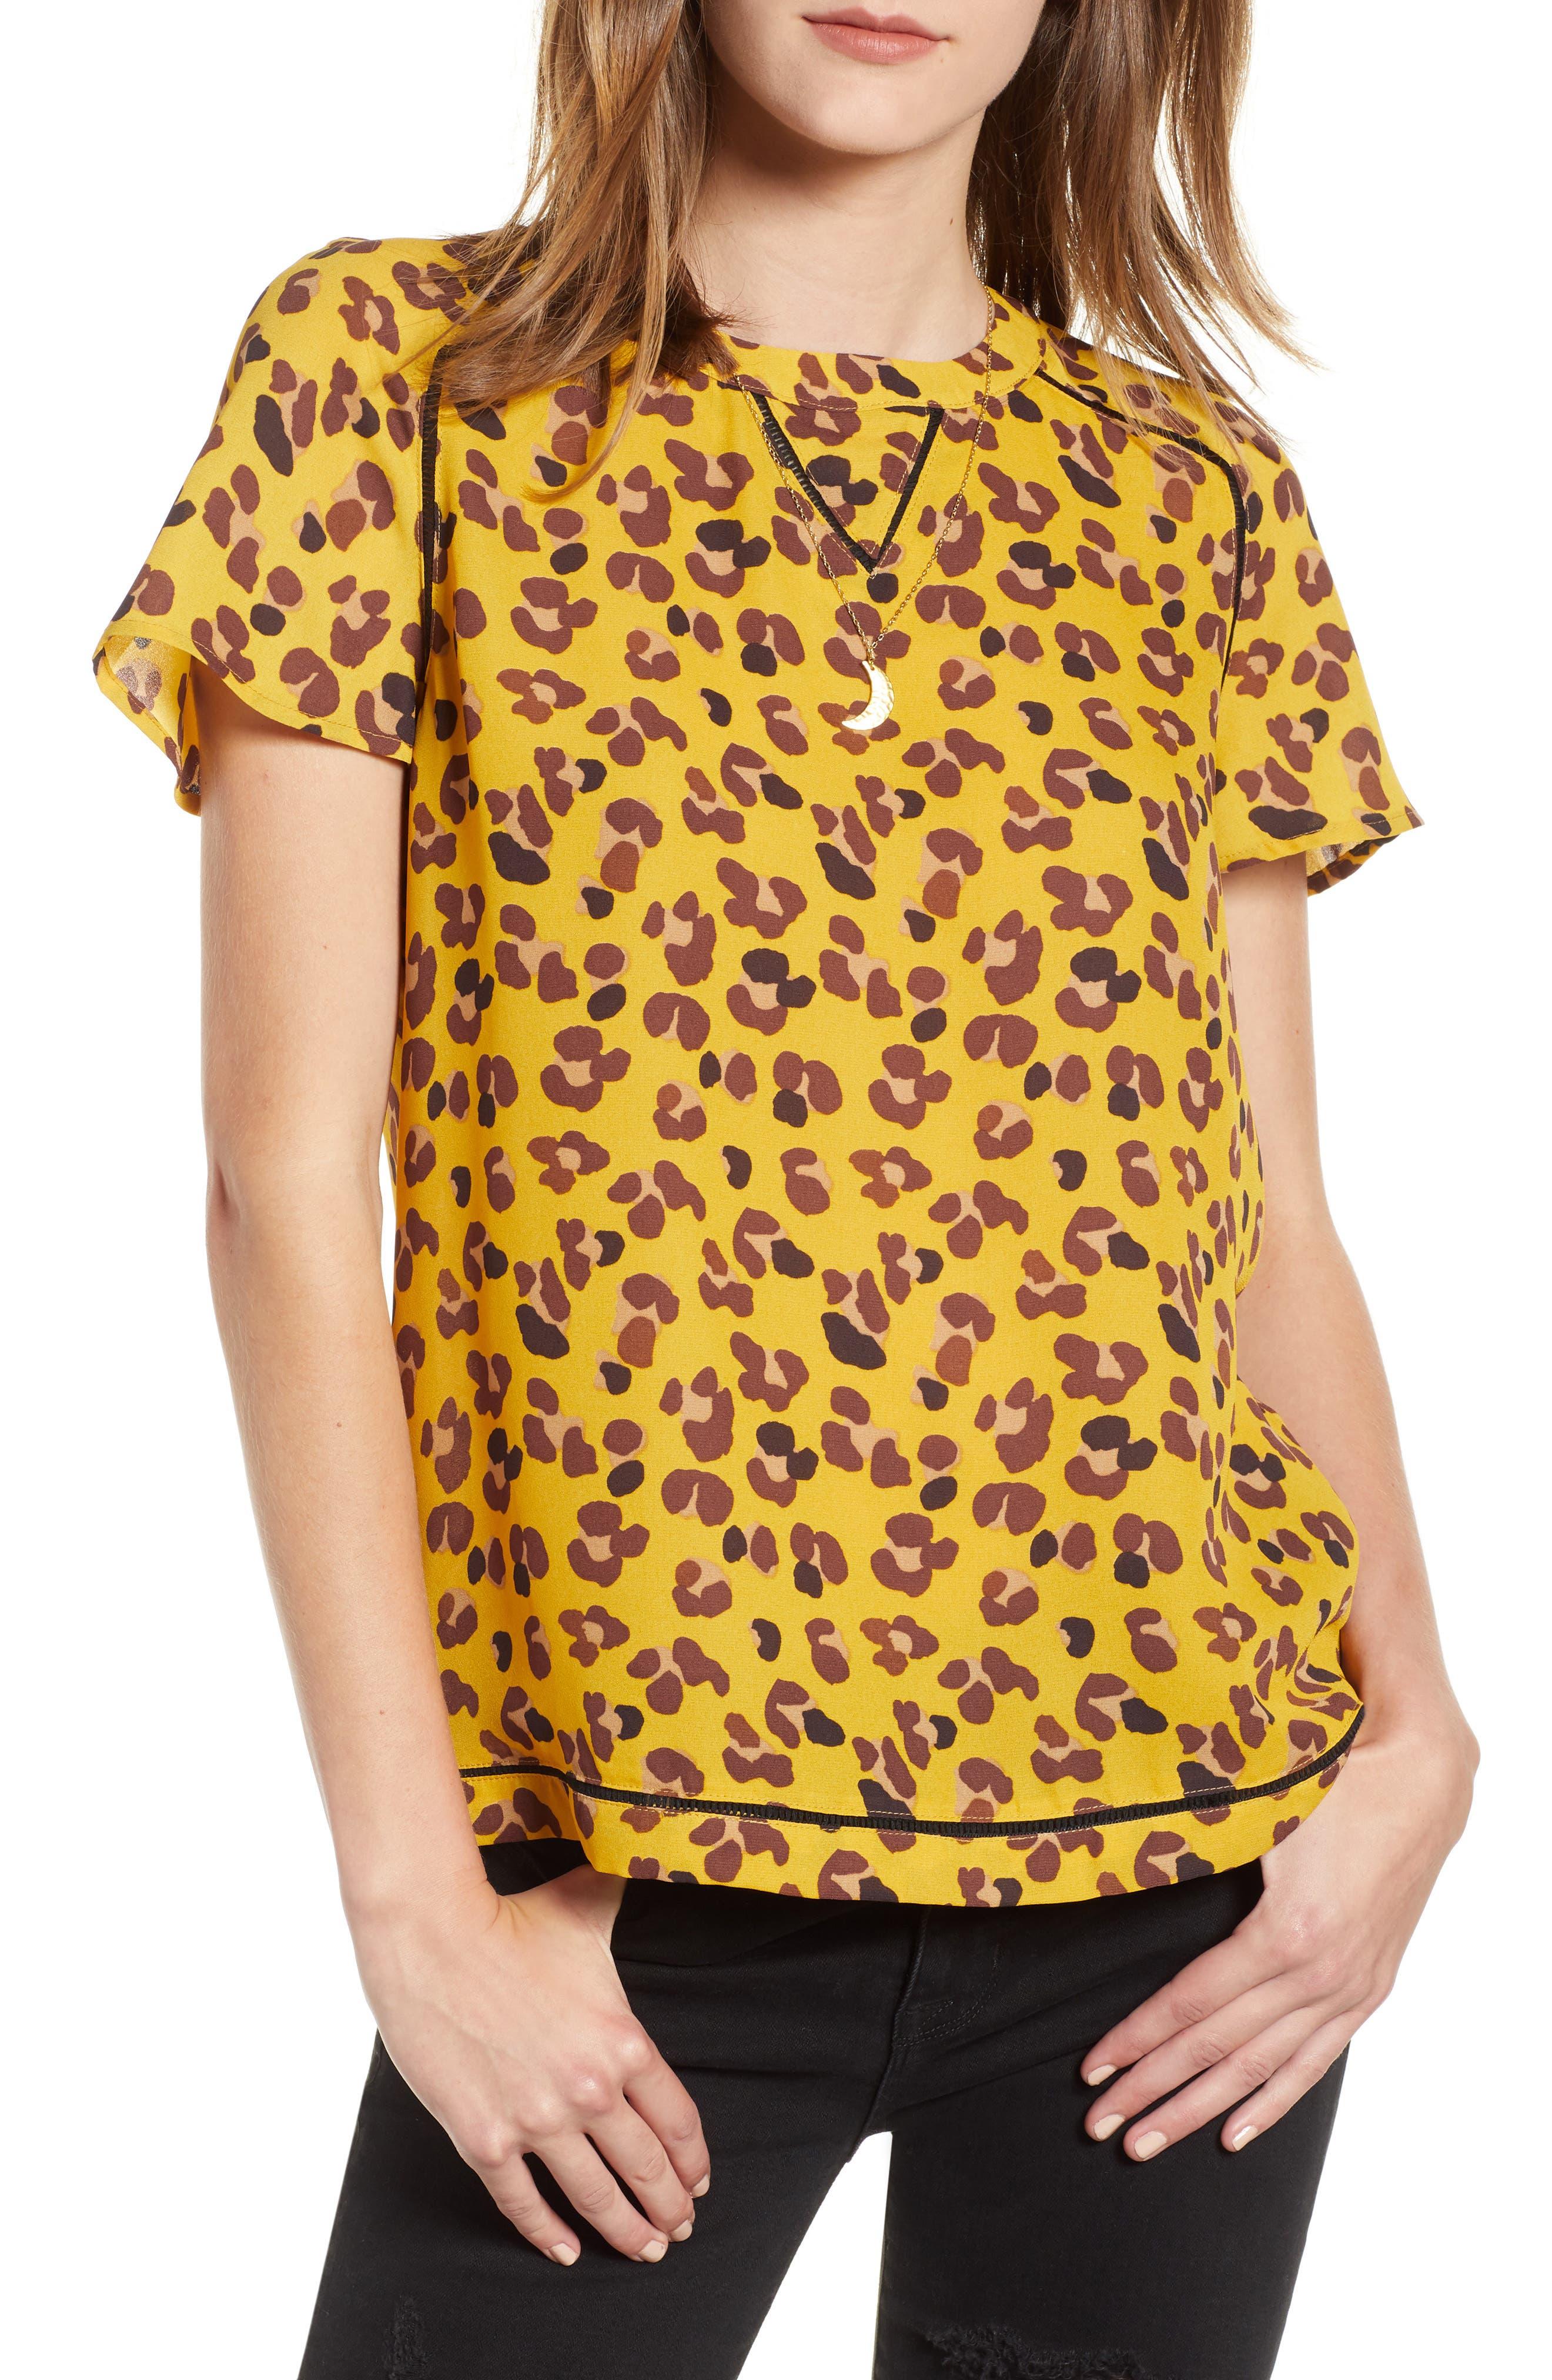 Leopard Print Top,                             Main thumbnail 1, color,                             YELLOW LEOPARD PRINT